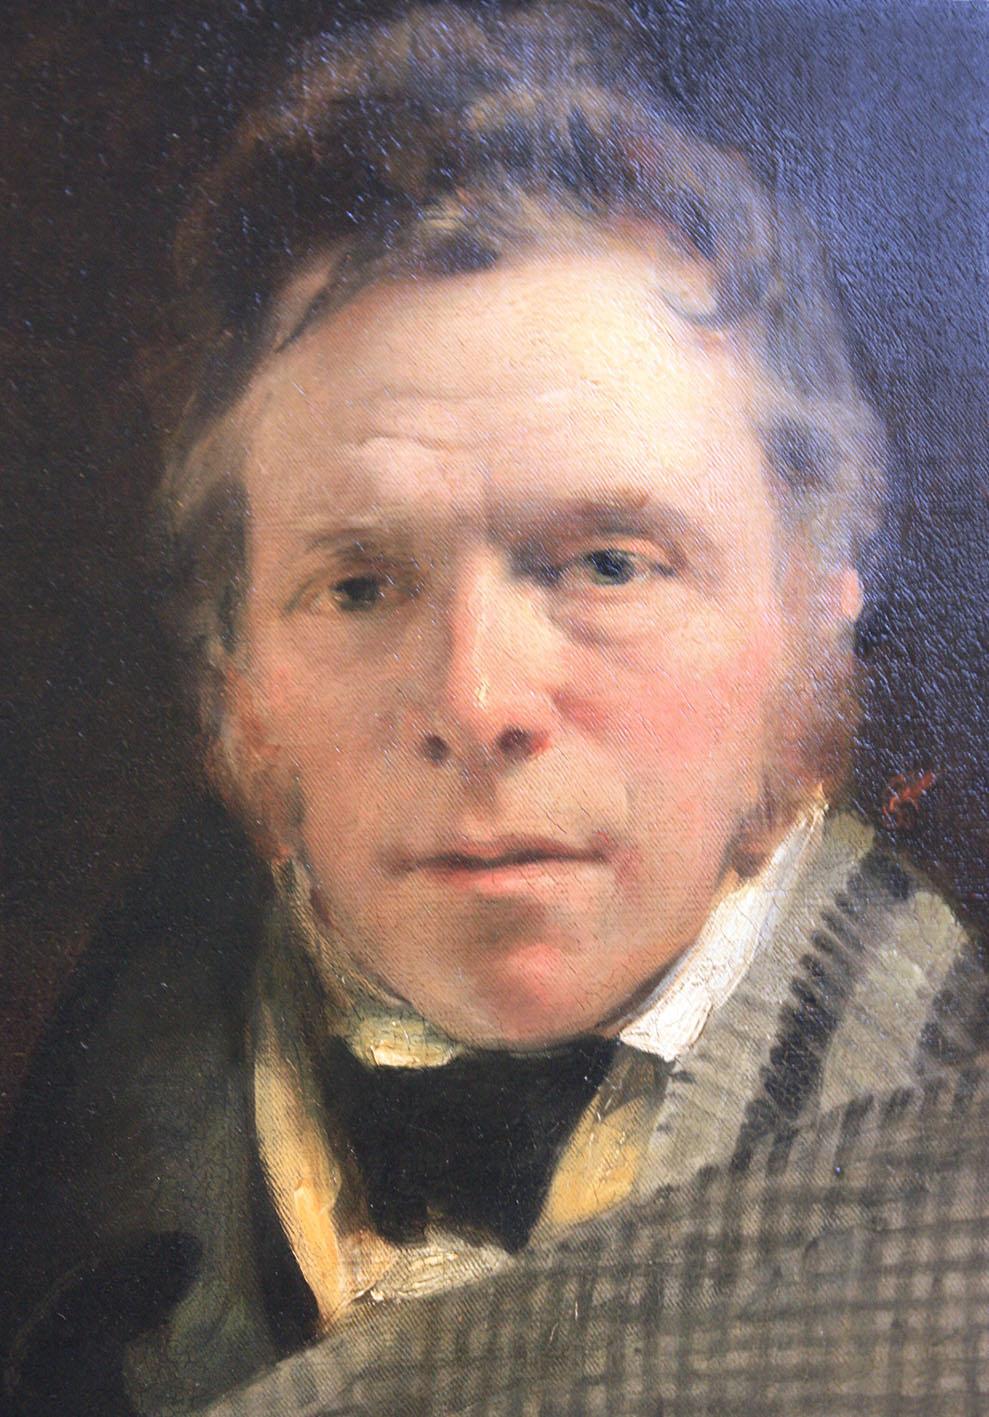 Hogg aged 60